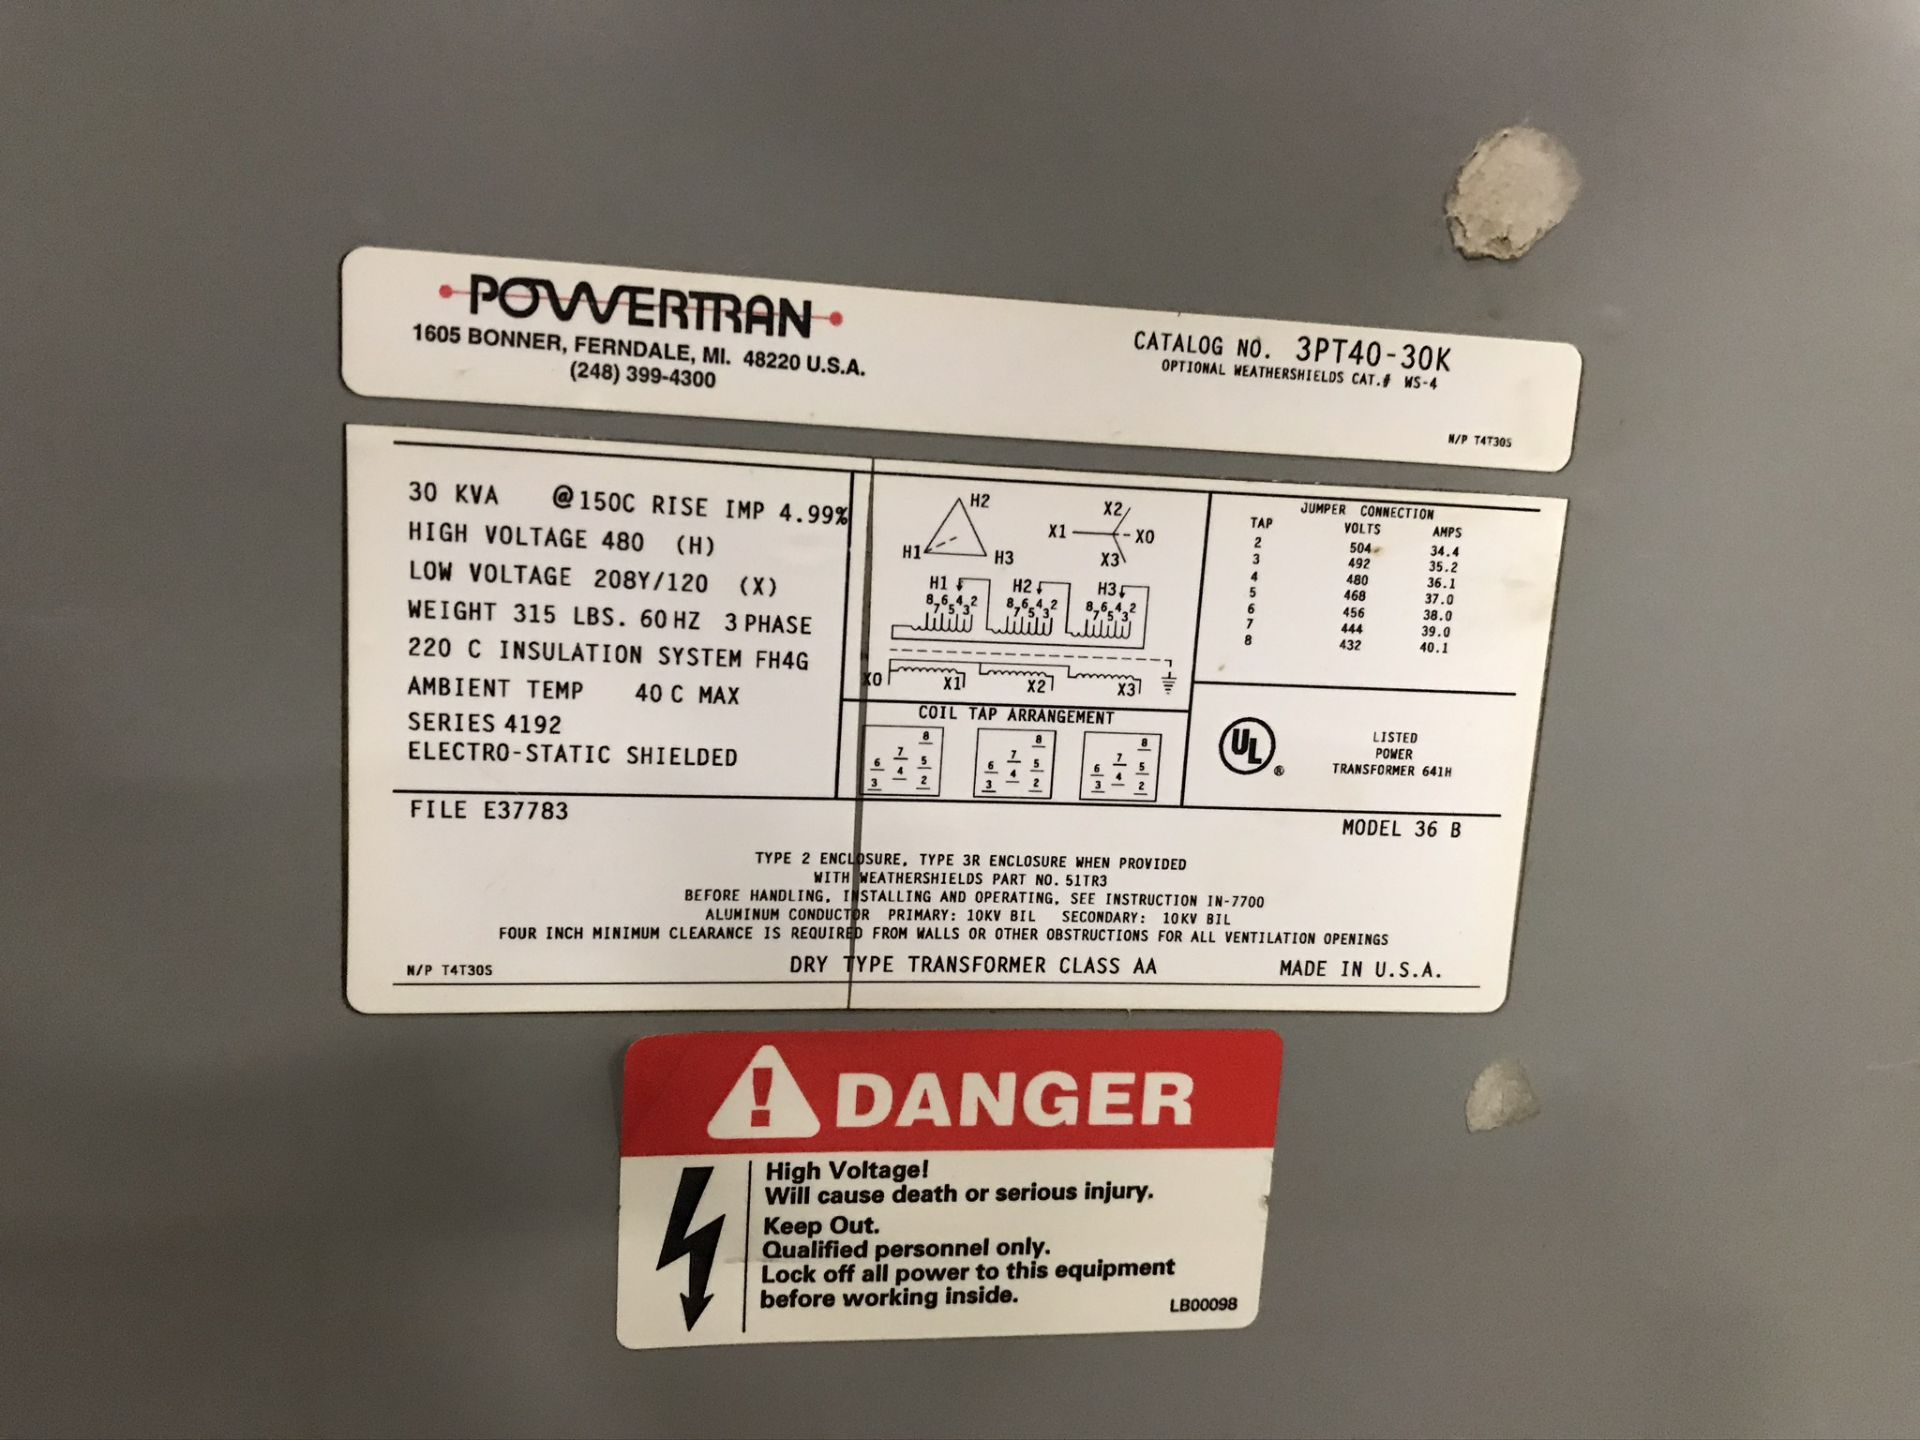 Powertran 30 KVA Transformer - Image 2 of 2